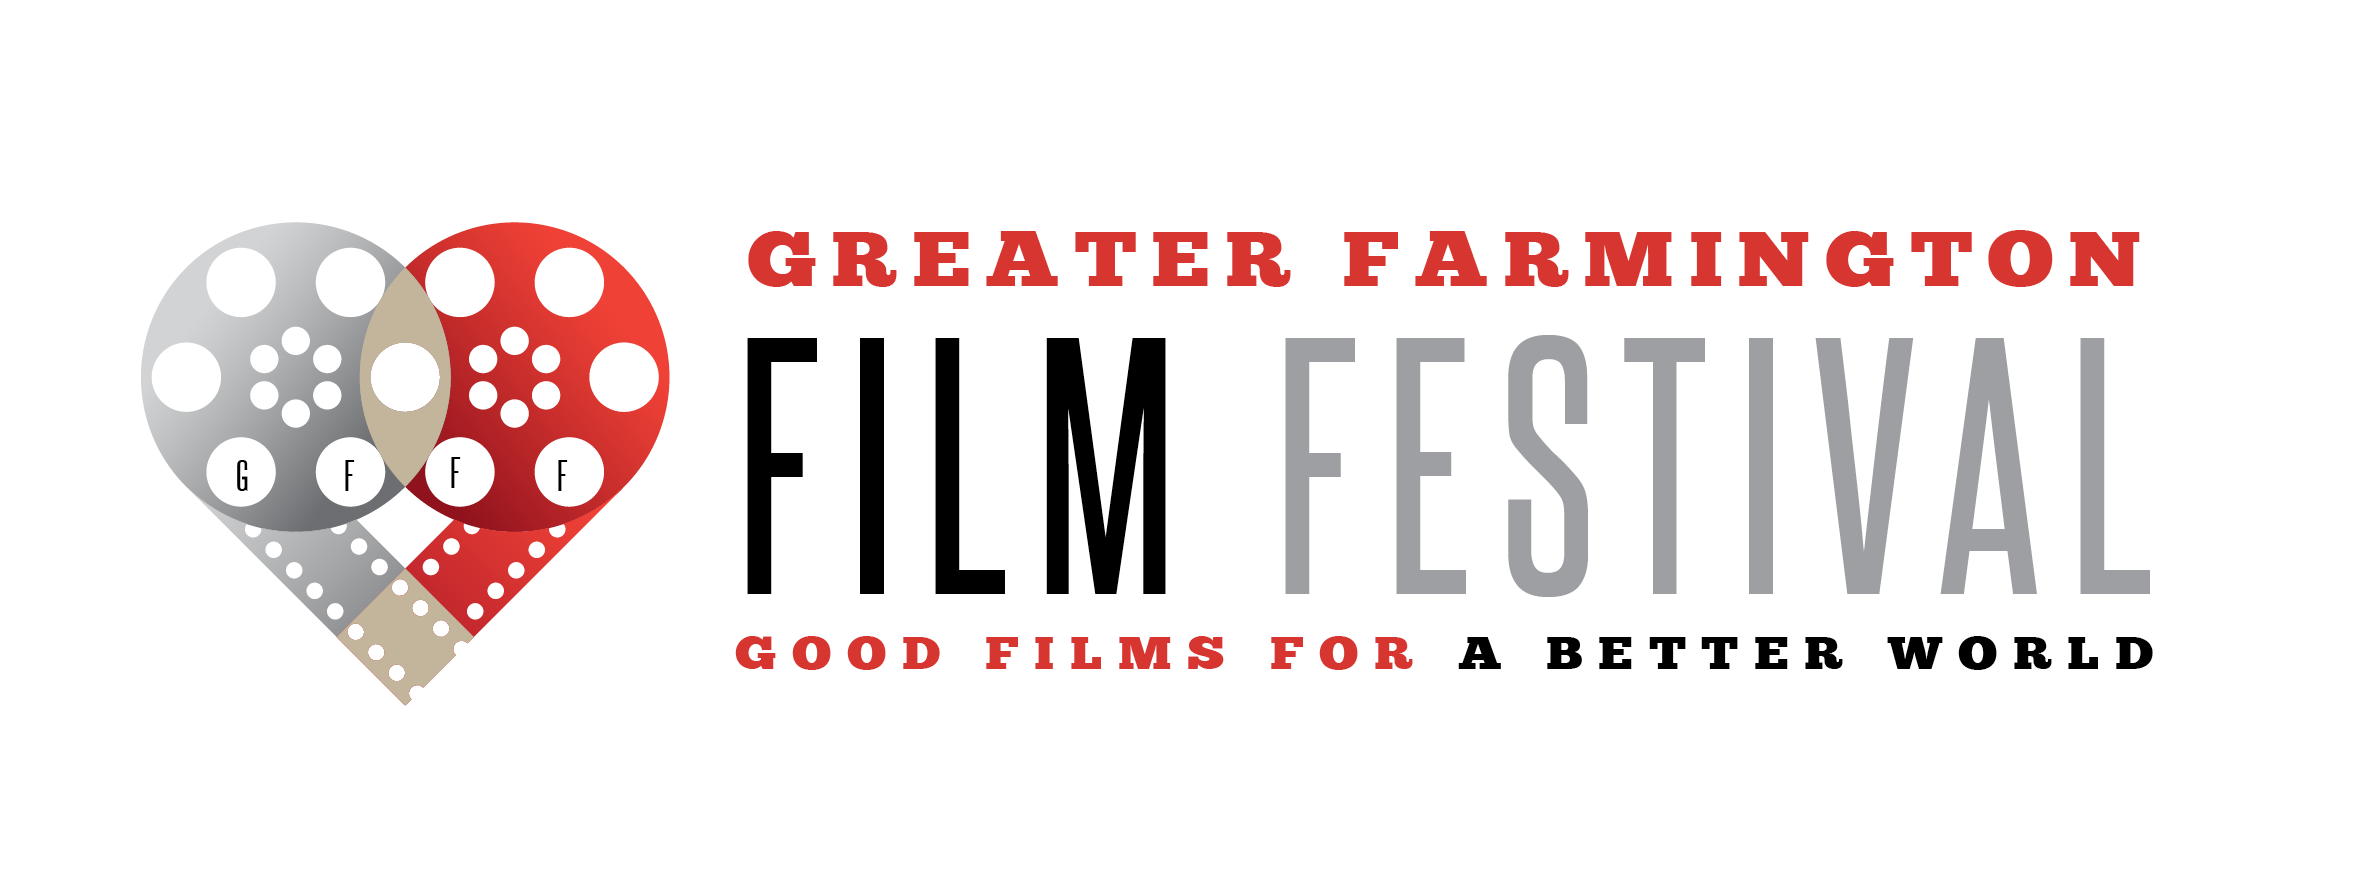 Greater Farmington Film Festival